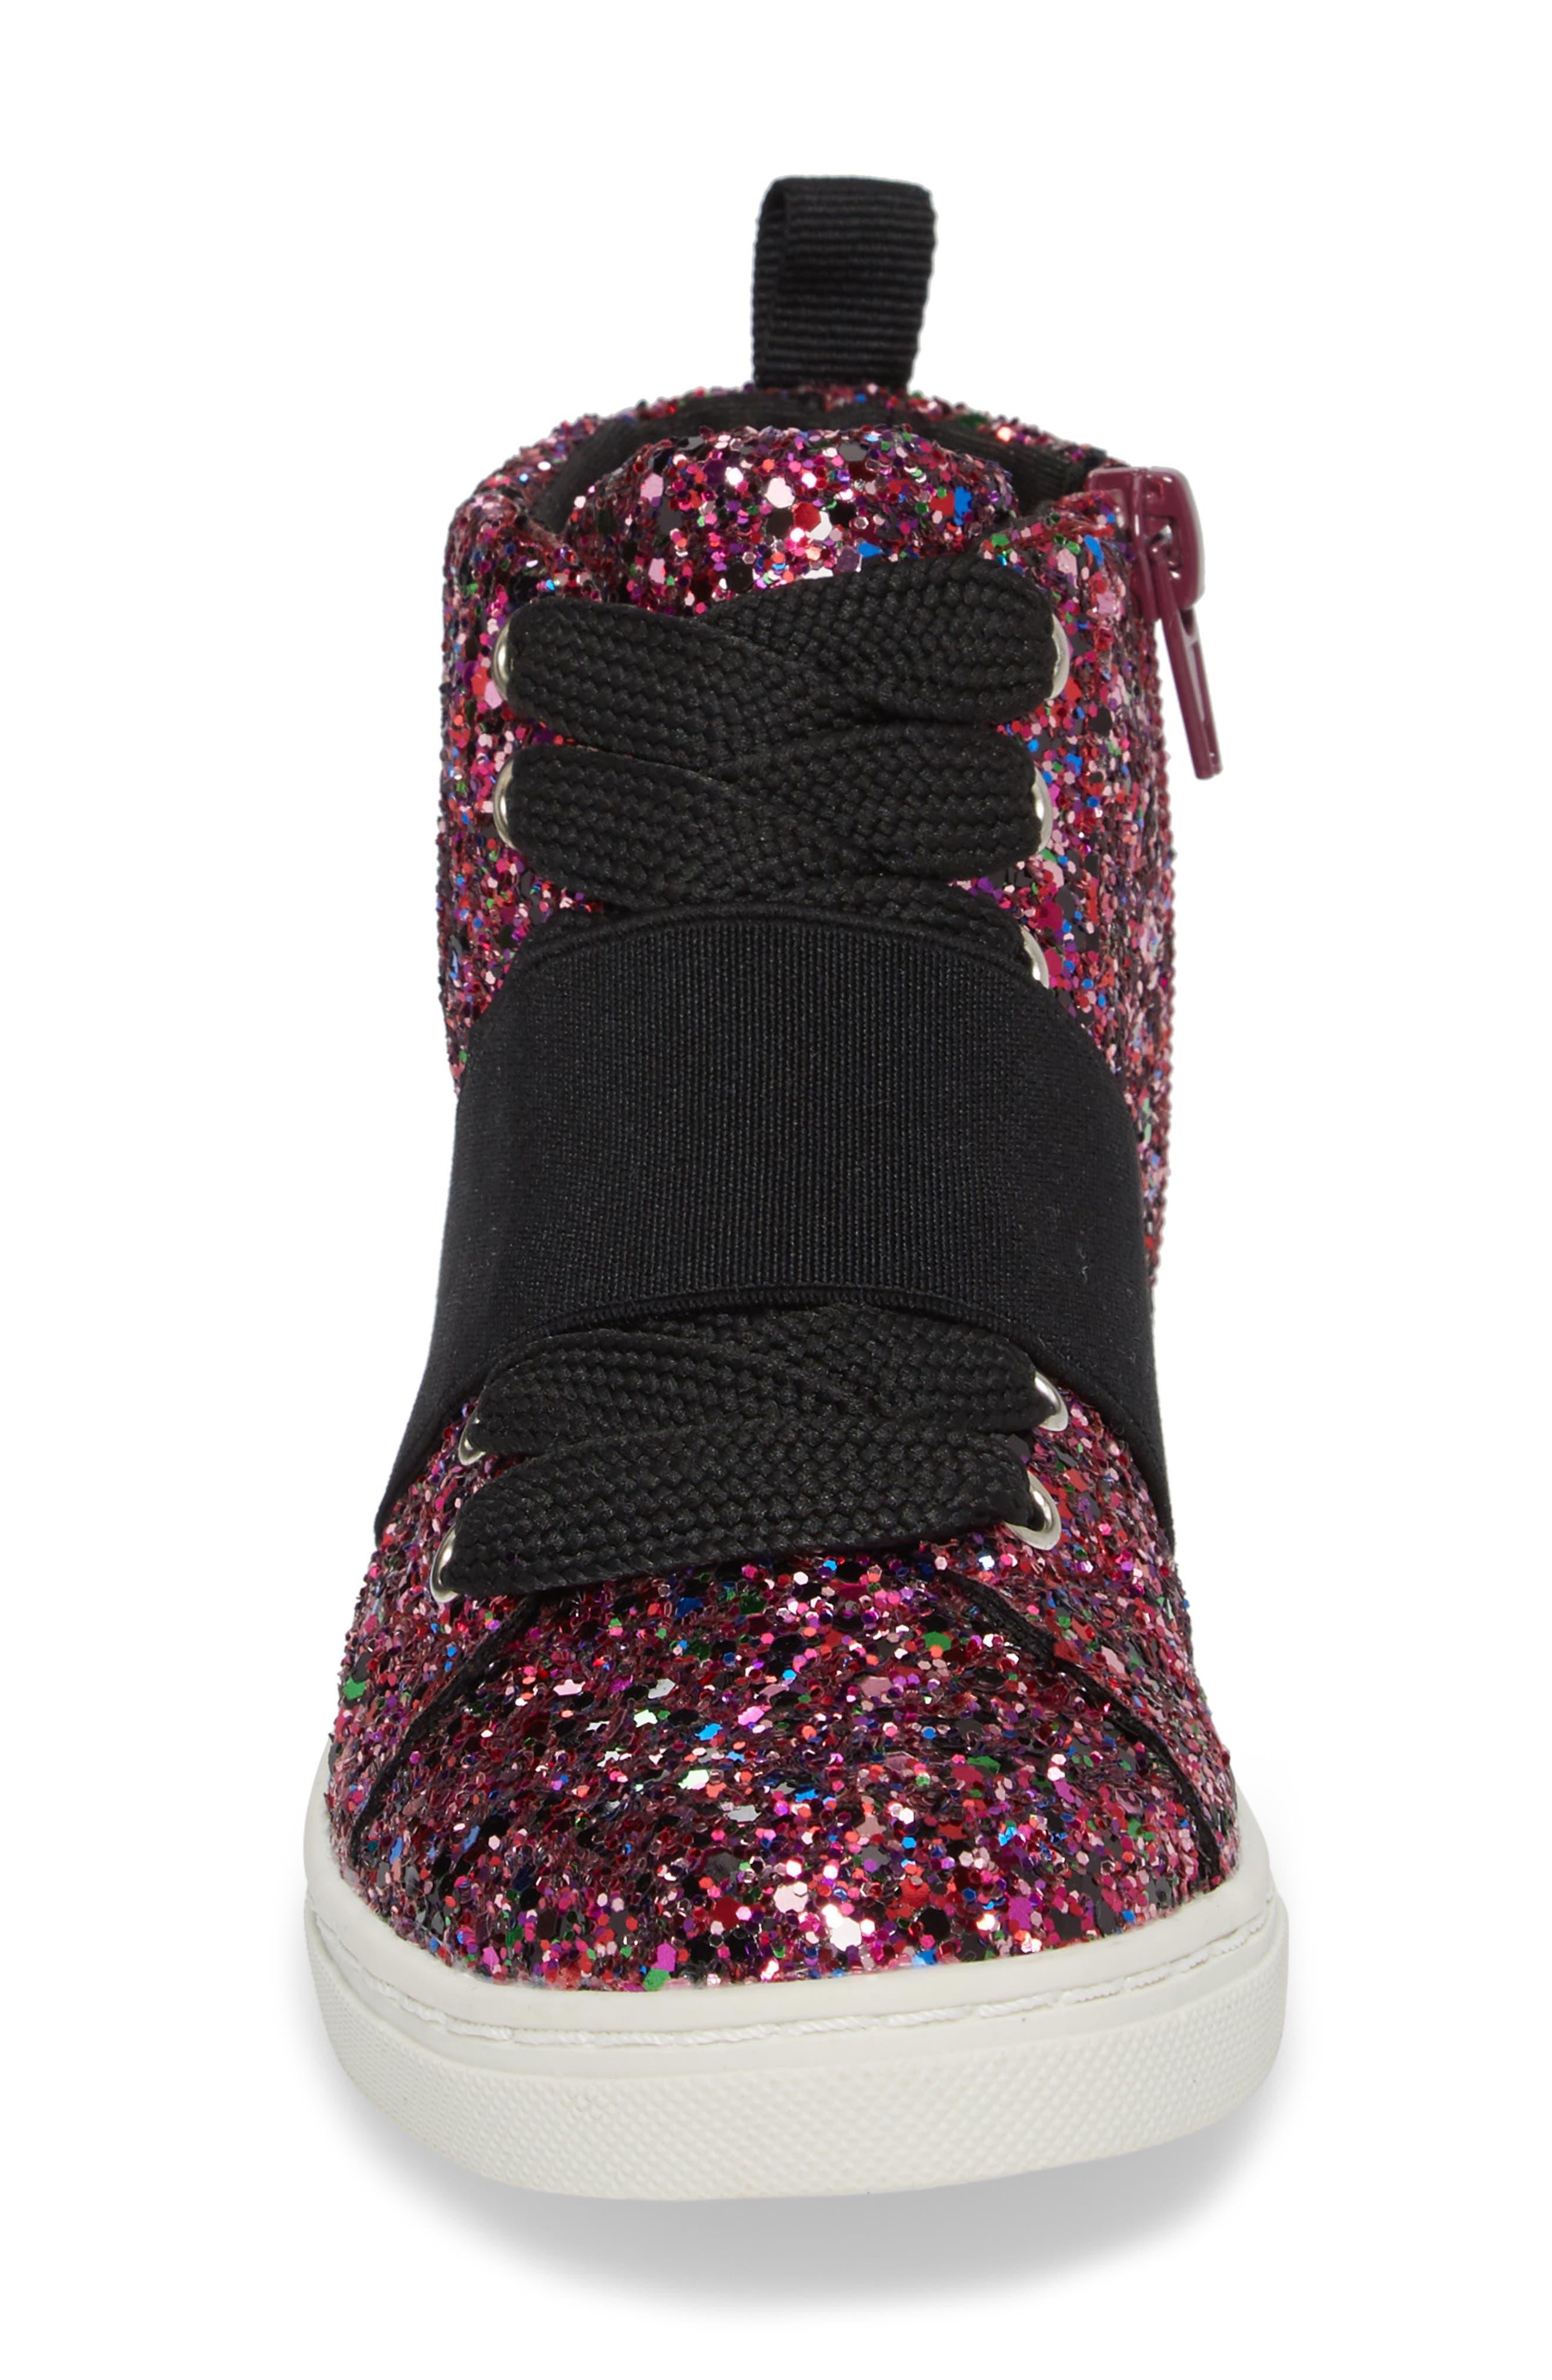 Zoa High Top Sneaker,                             Alternate thumbnail 4, color,                             Fuchsia Glitter